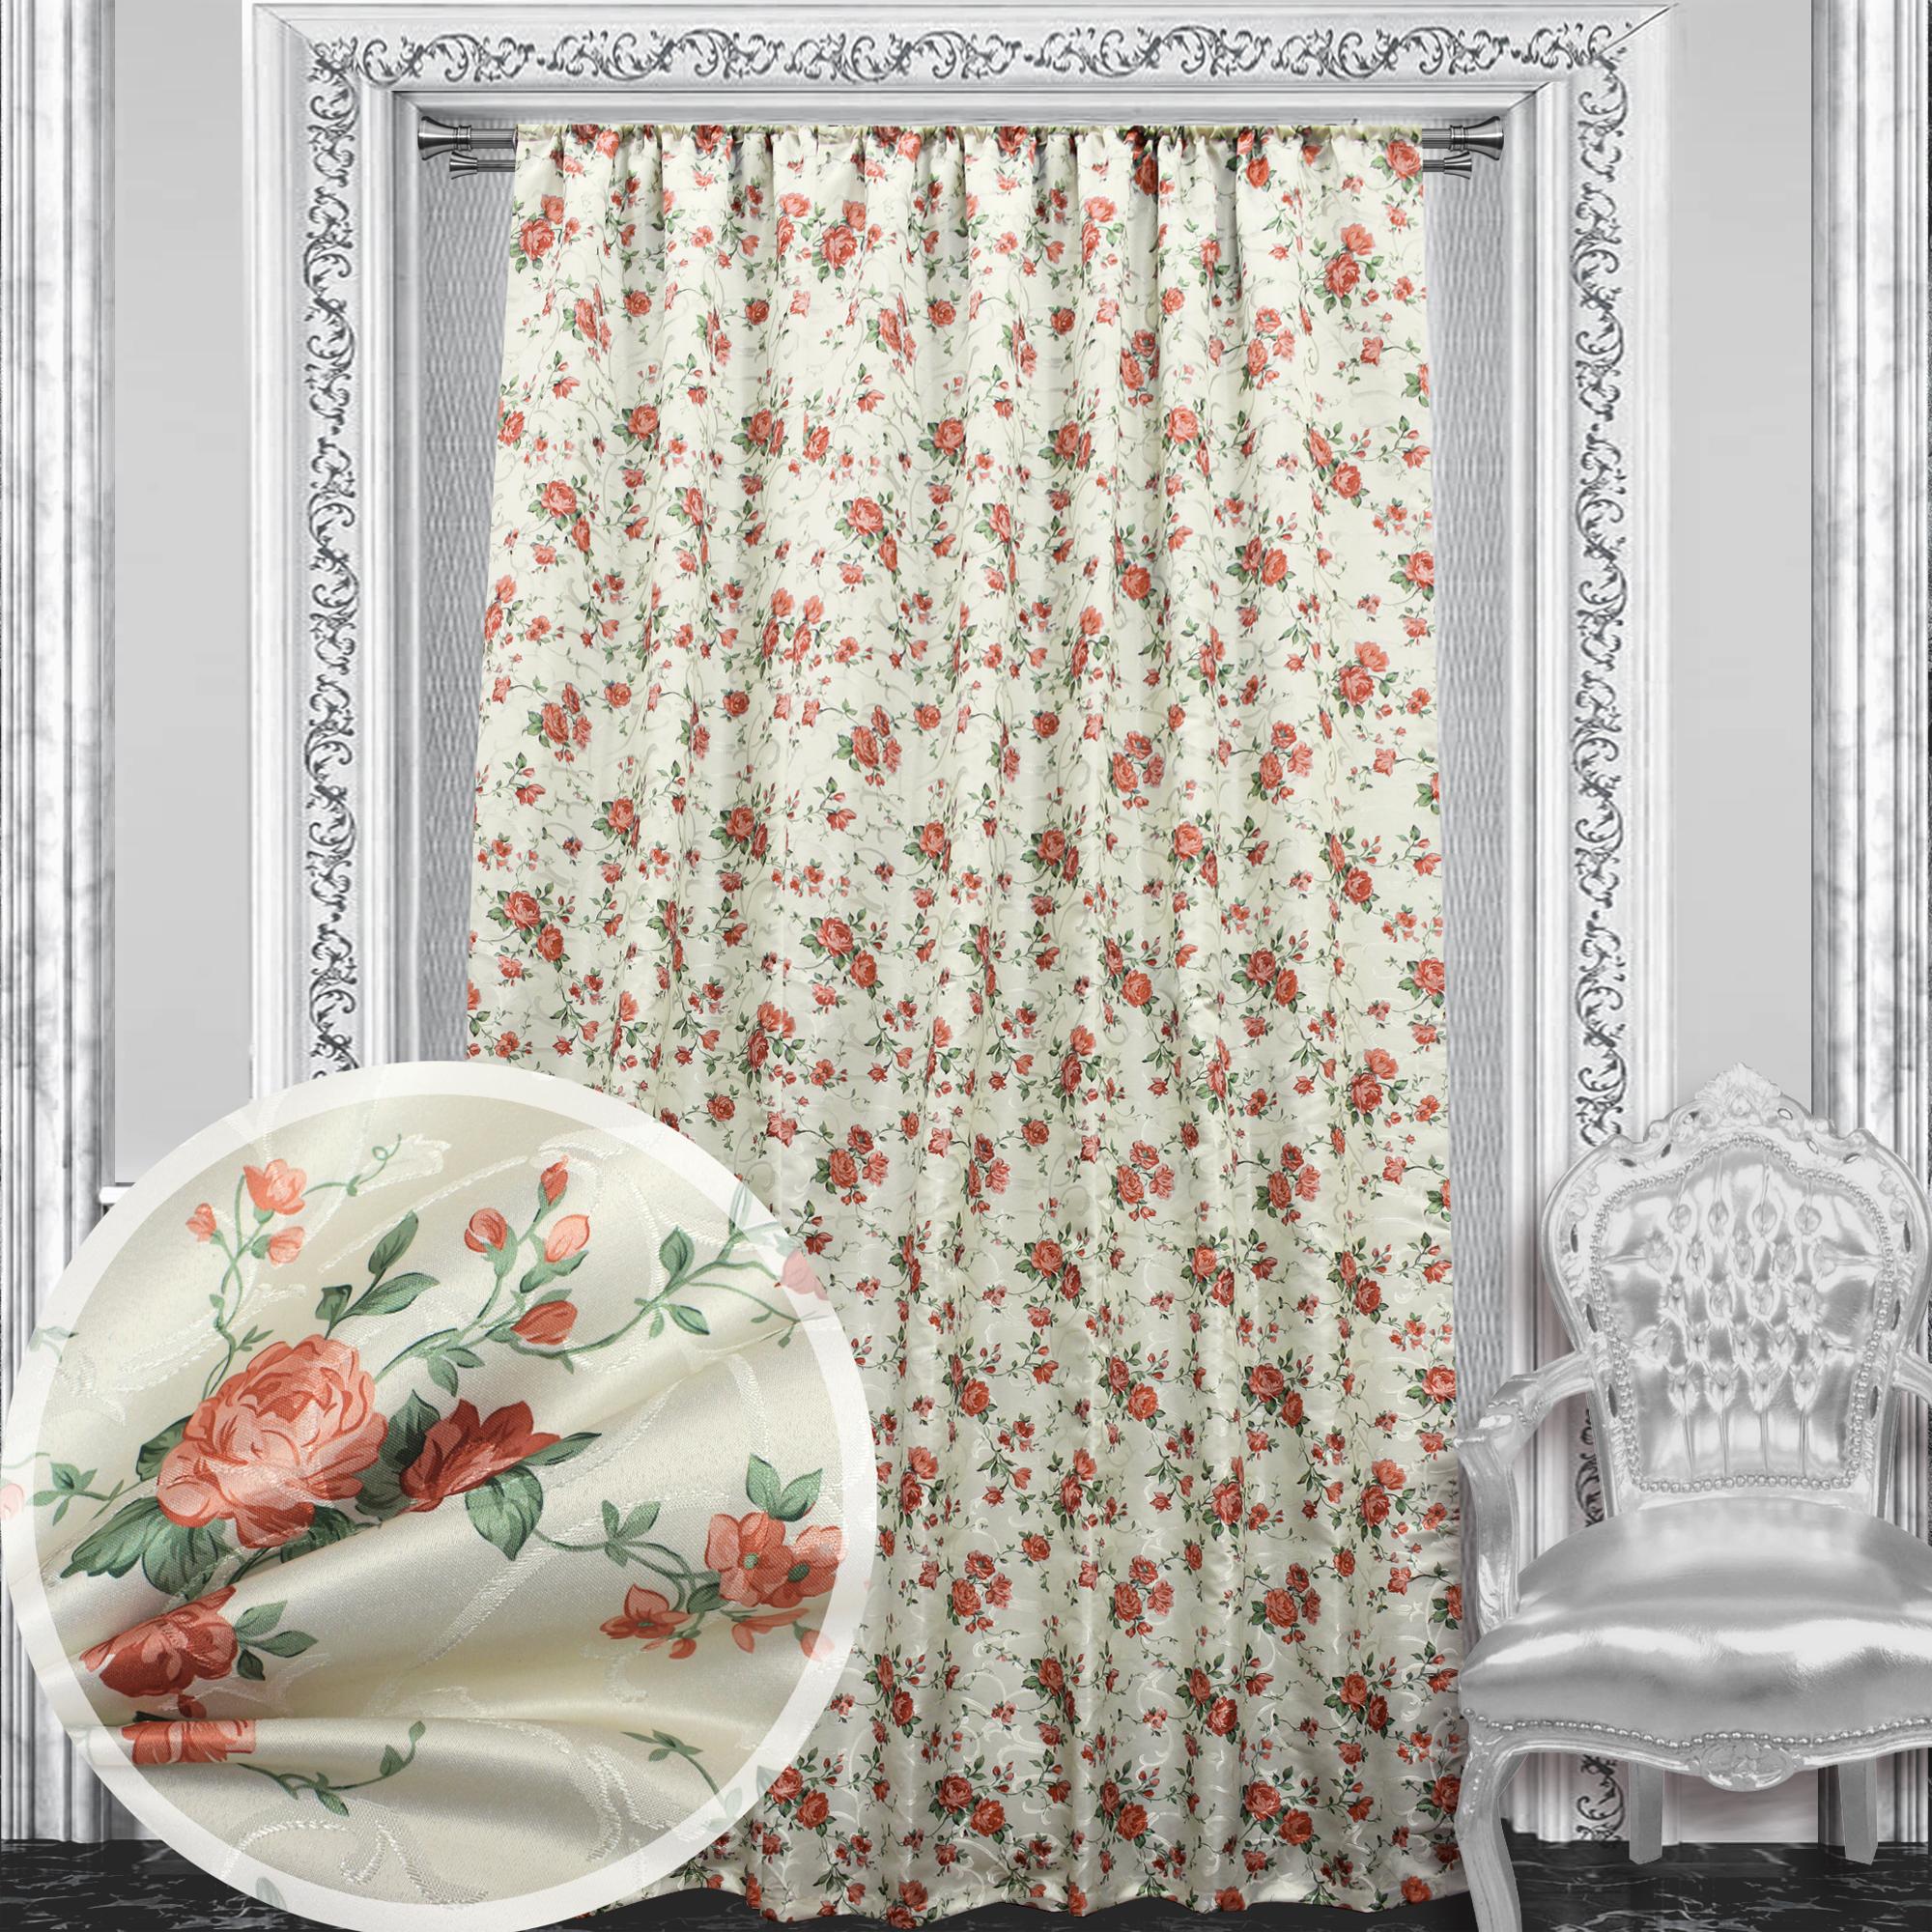 Шторы Amore Mio Классические шторы Carissa Цвет: Персиковый шторы tac классические шторы winx цвет персиковый 200x265 см